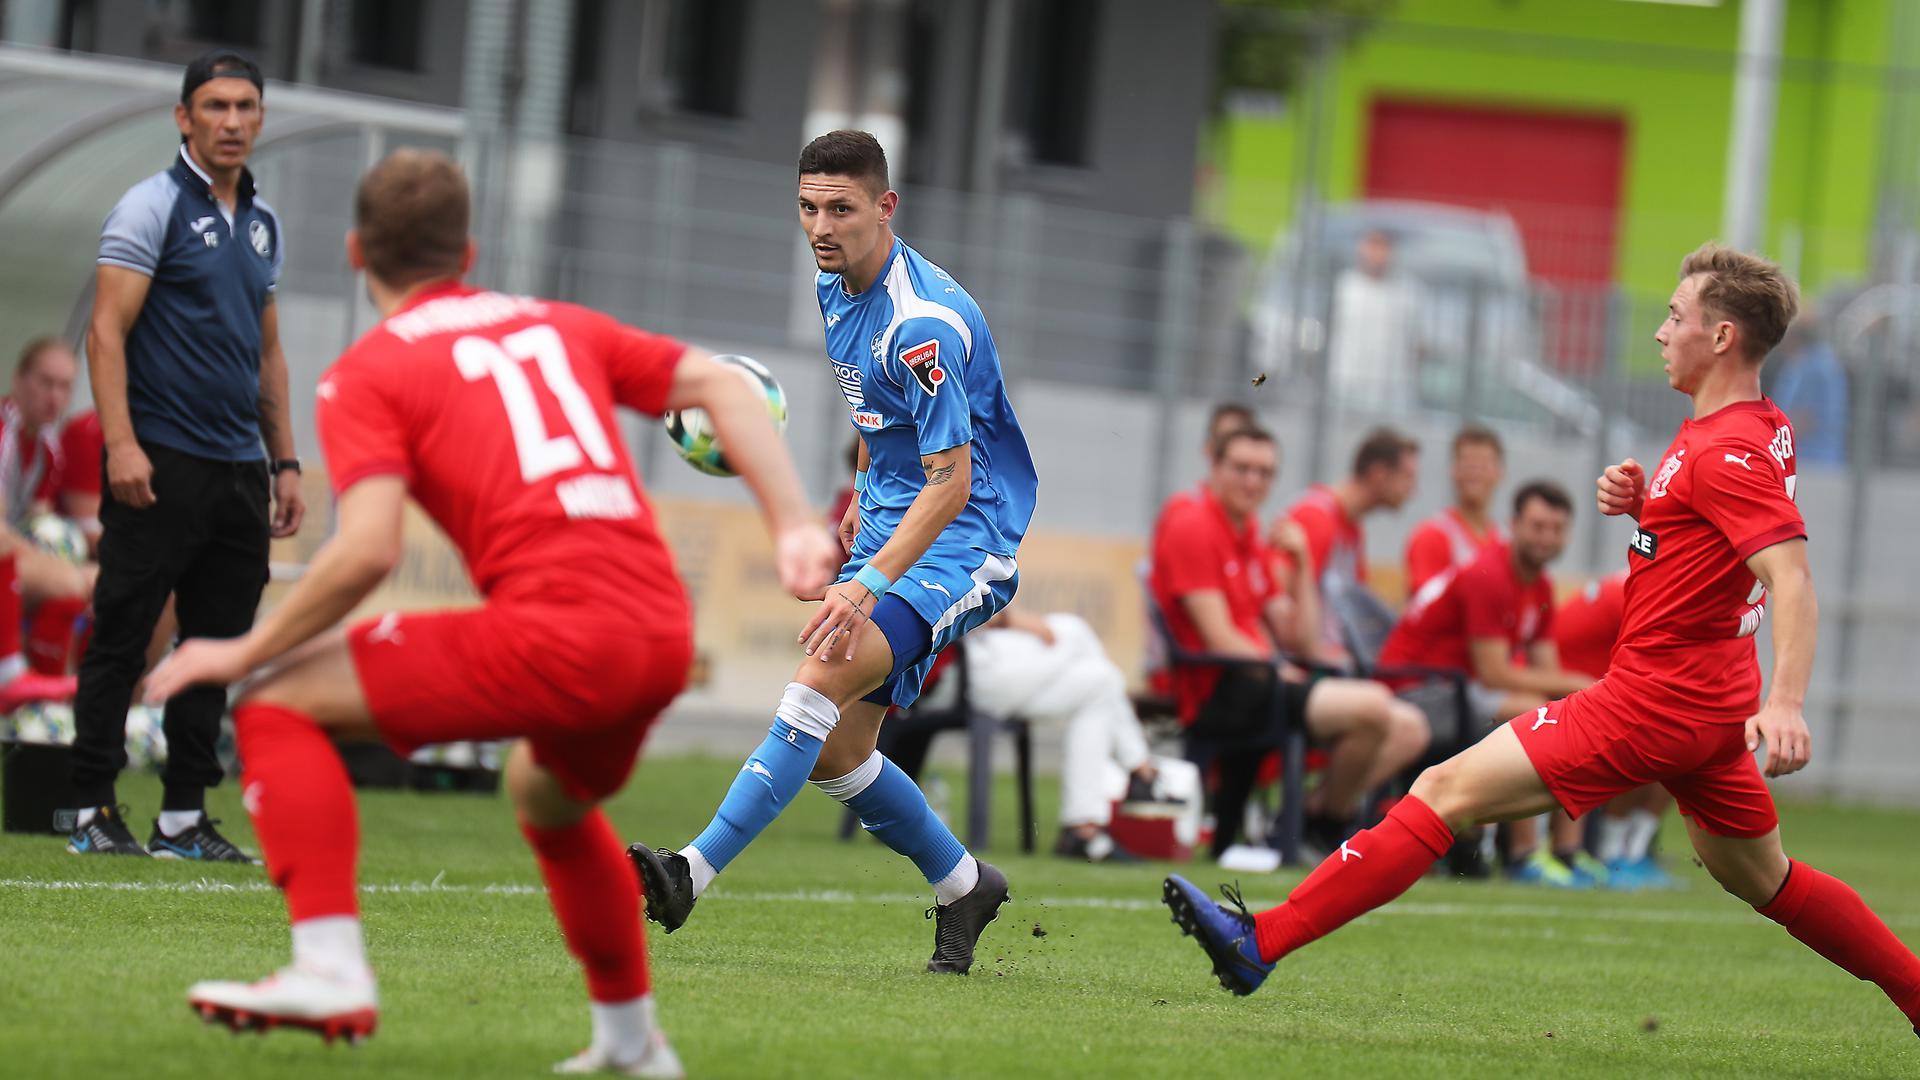 Marcorig MaurizioCfR blau_Amrhein Fabian27_Mikulic Jakob re beide FCF rot